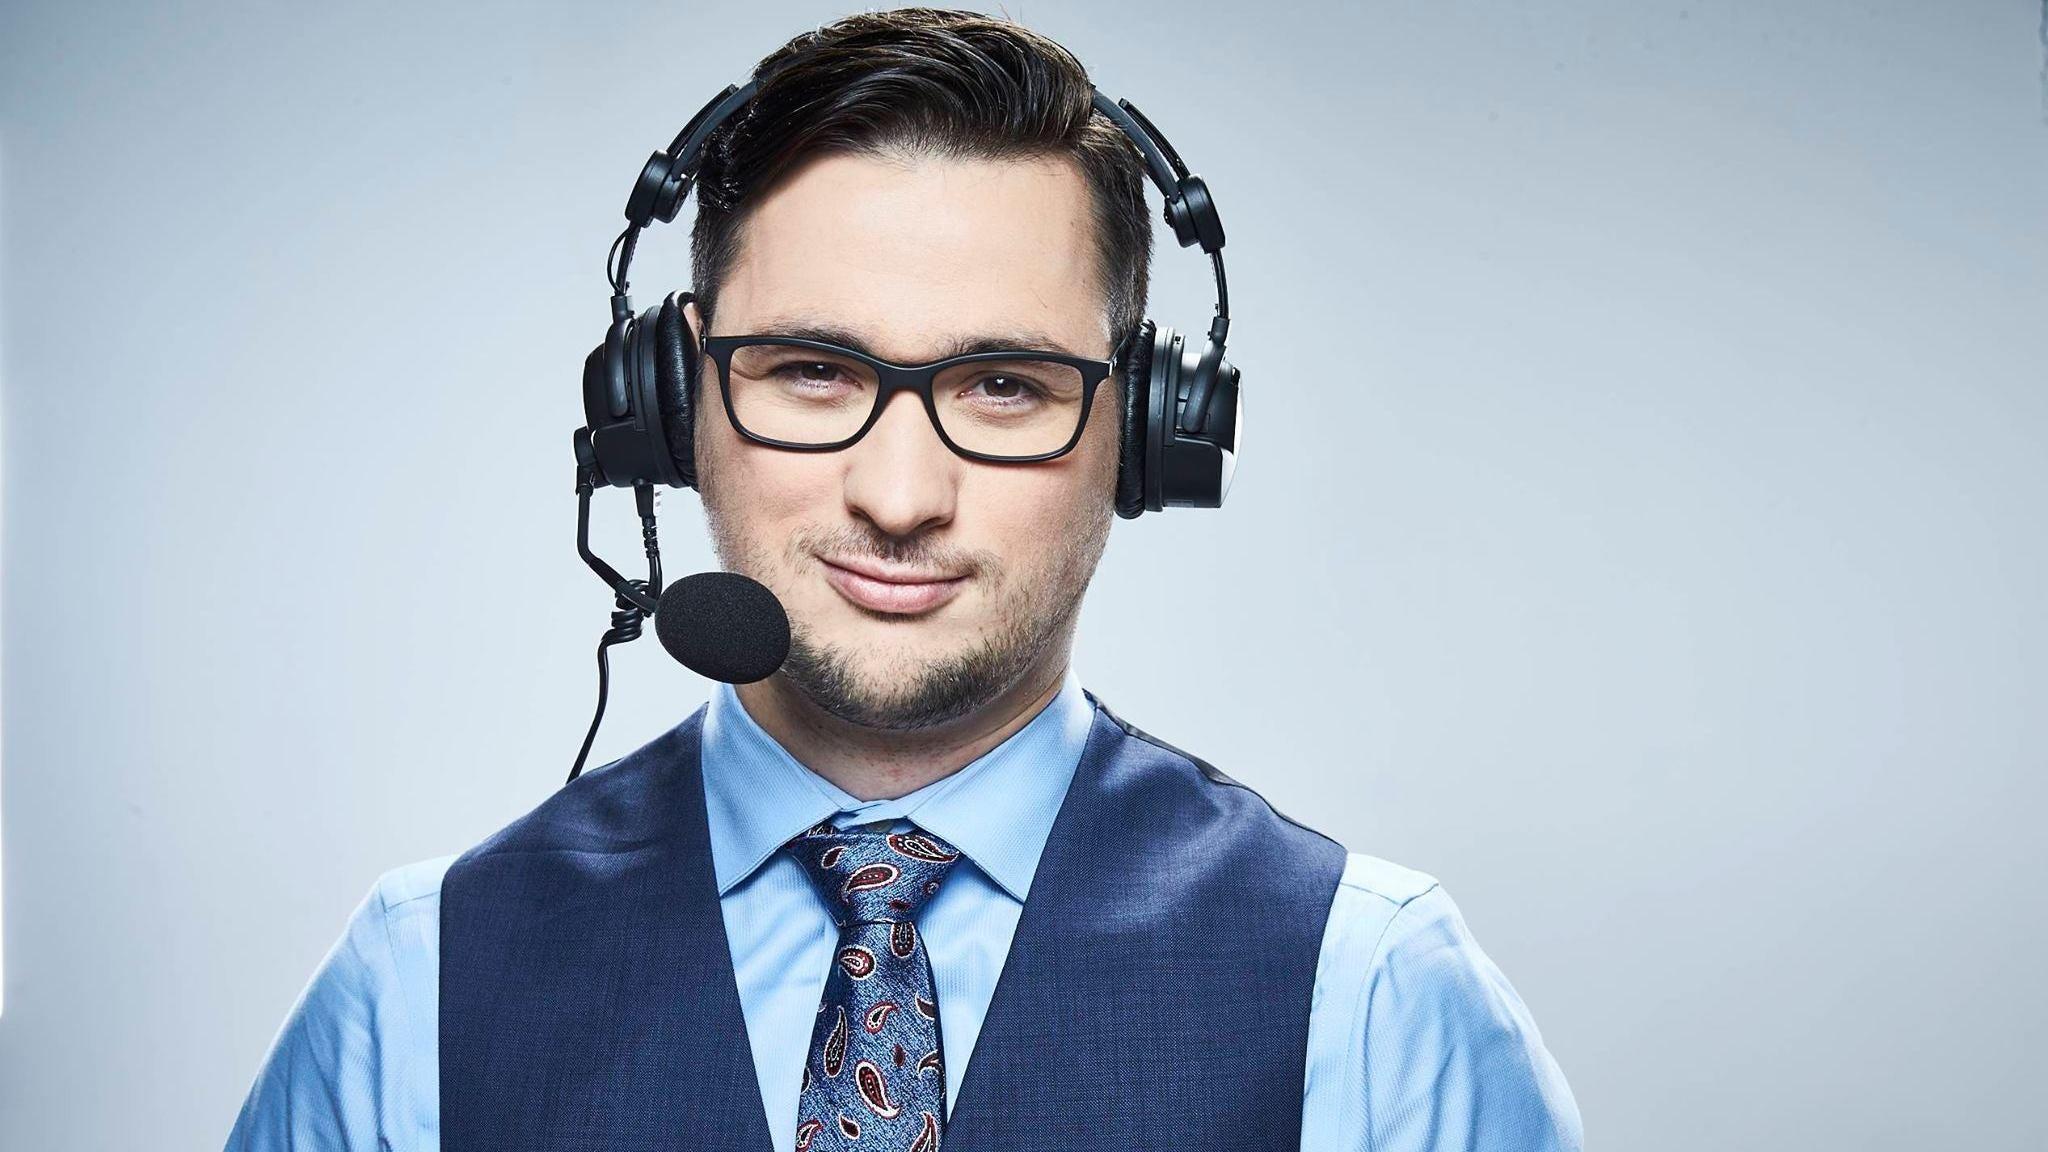 Counter-Strike Commentator Drops Racial Slur During Birthday Stream